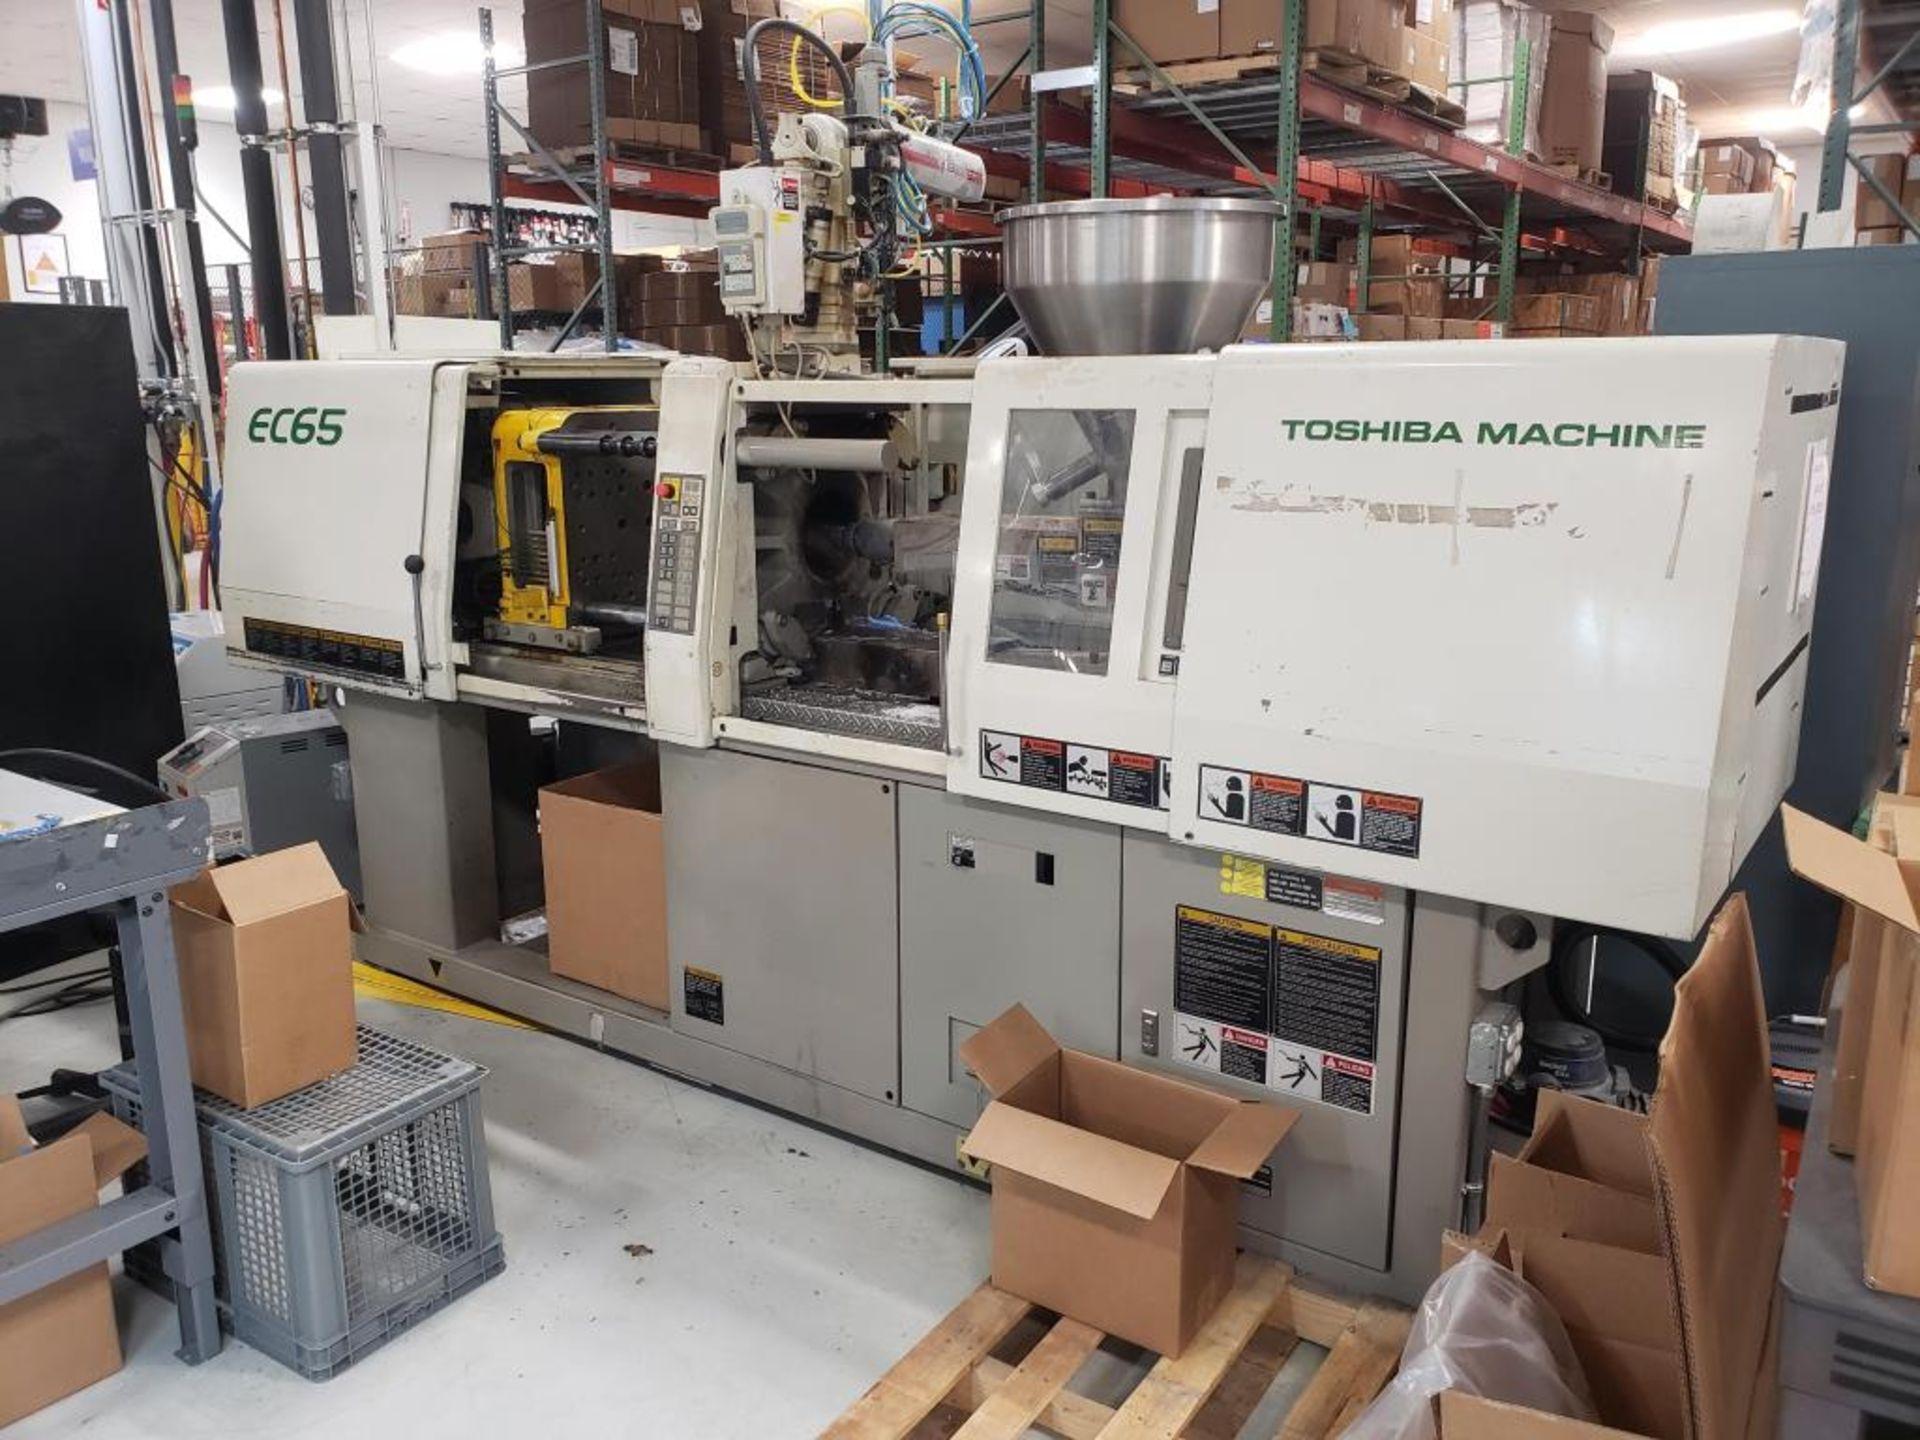 Injection Molding Machine - Image 3 of 7